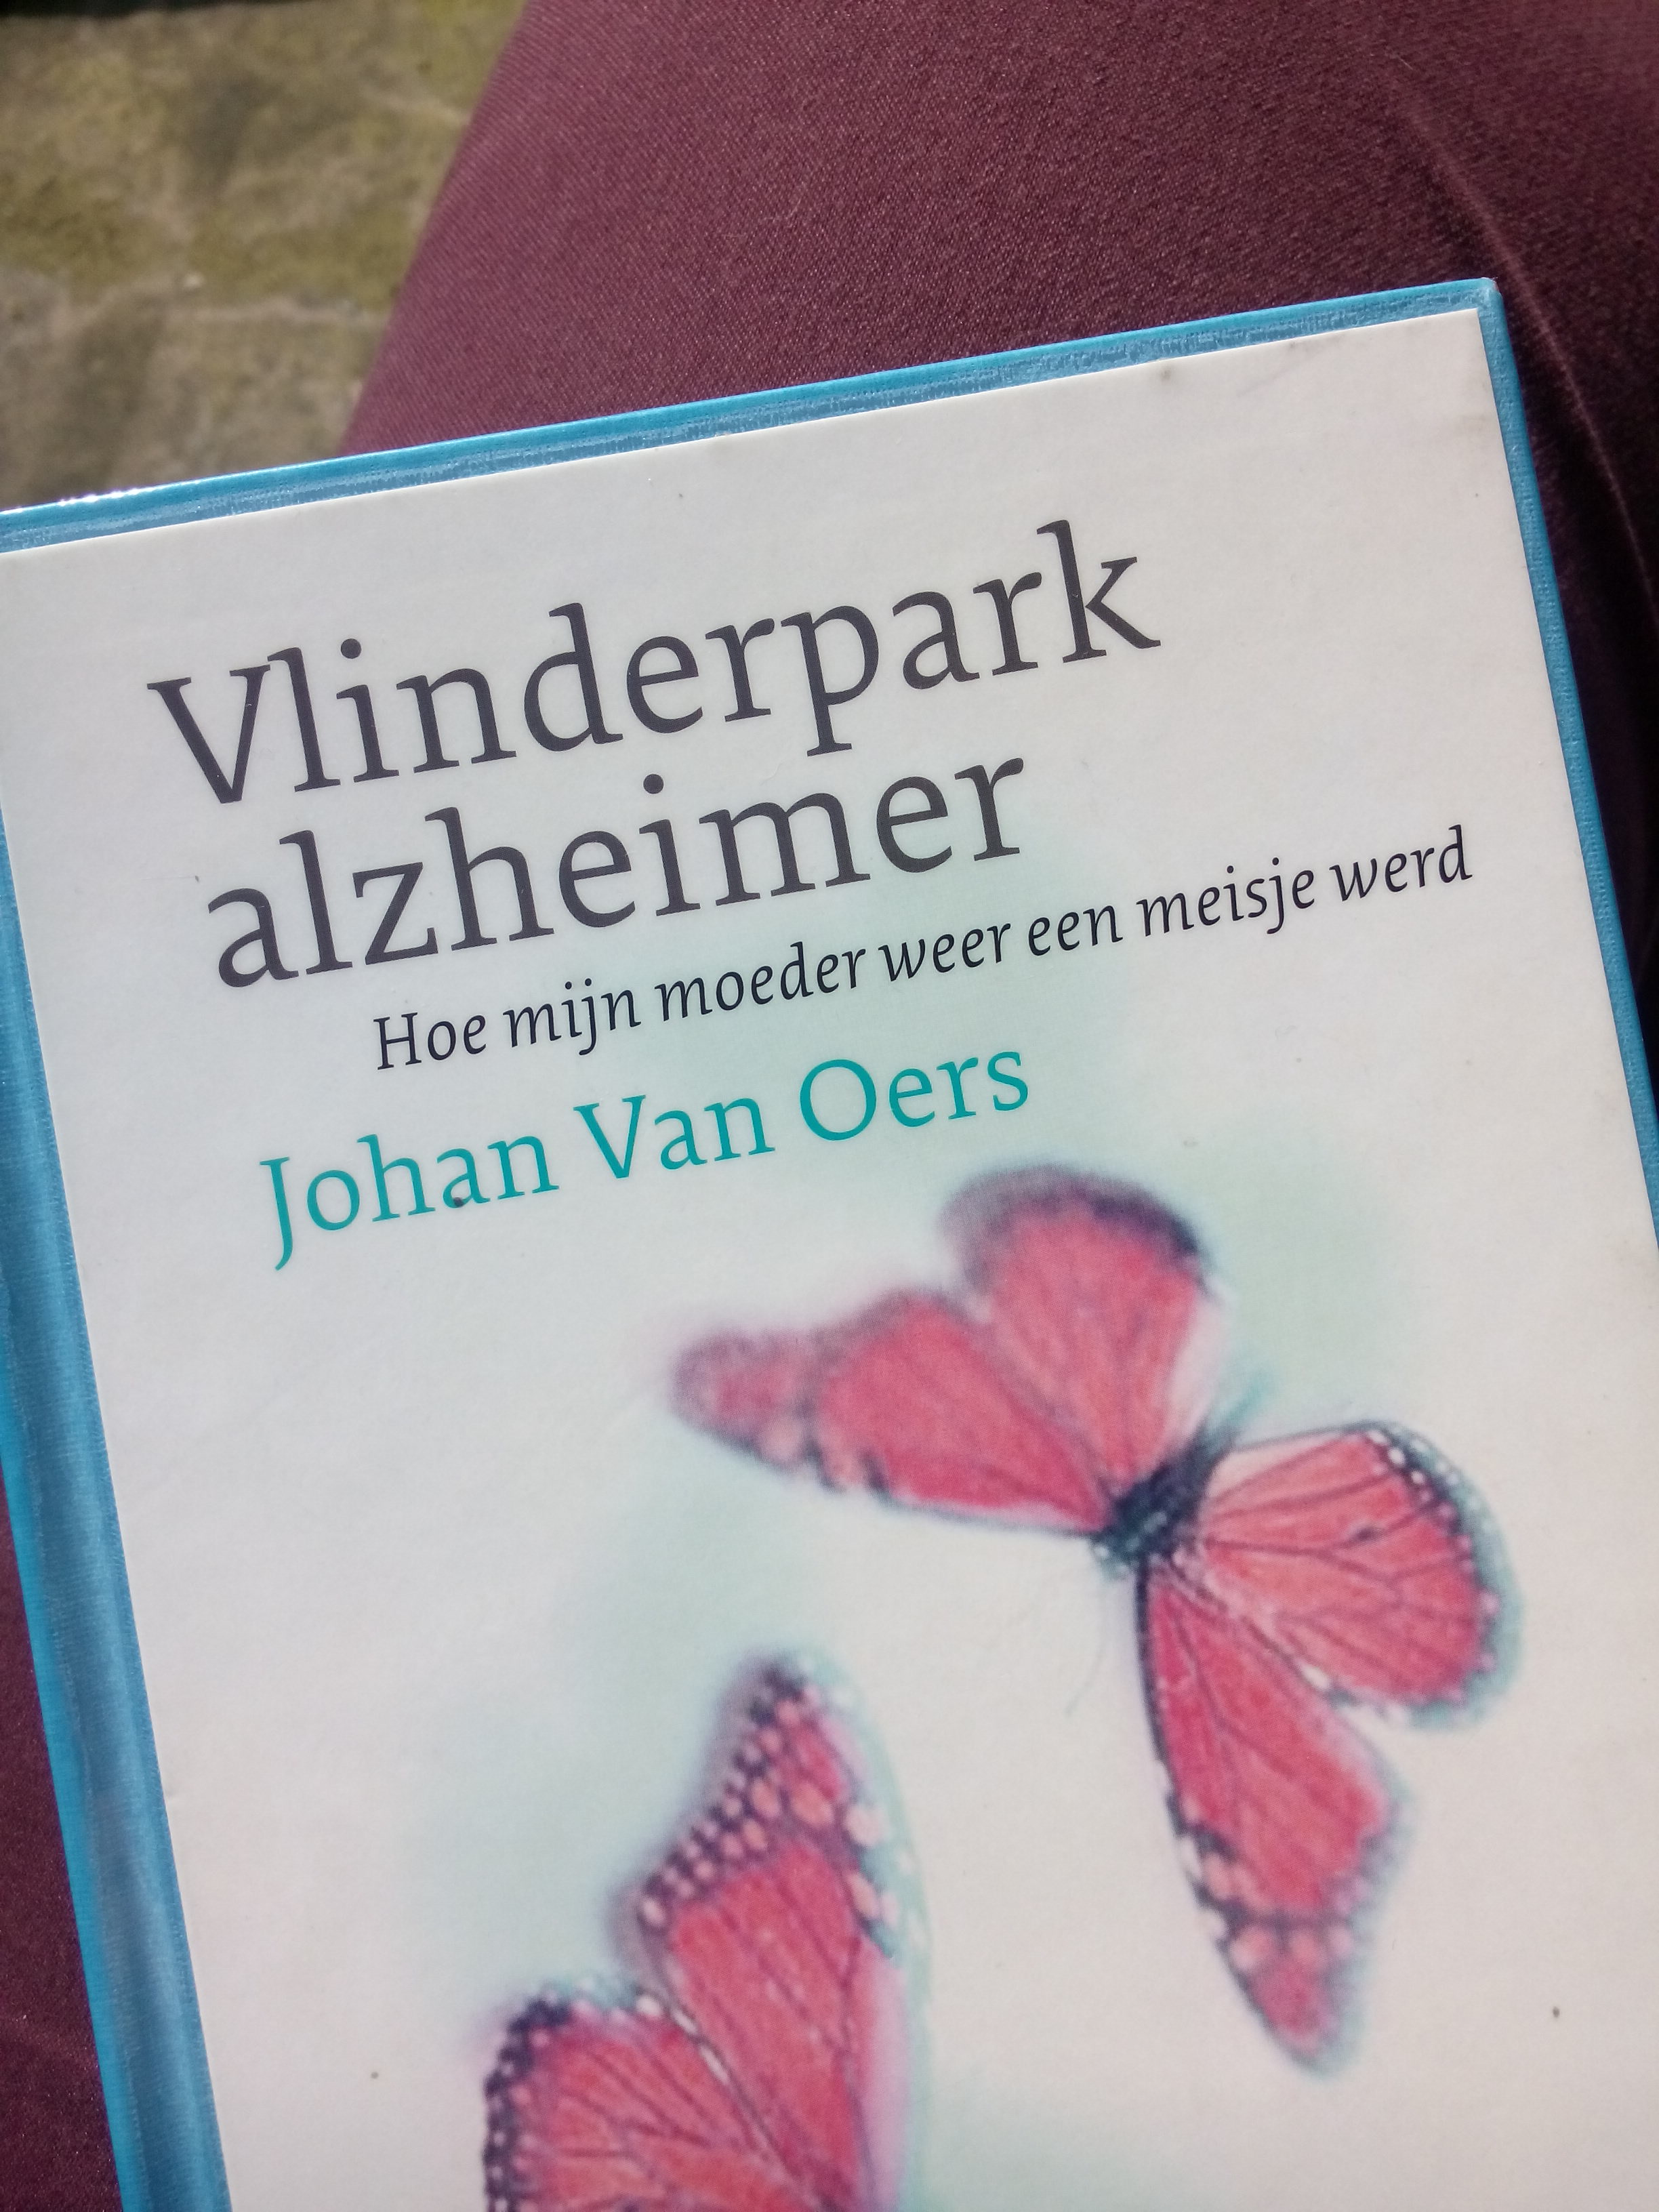 Vlinderpark alzheimer Johan Van Oers